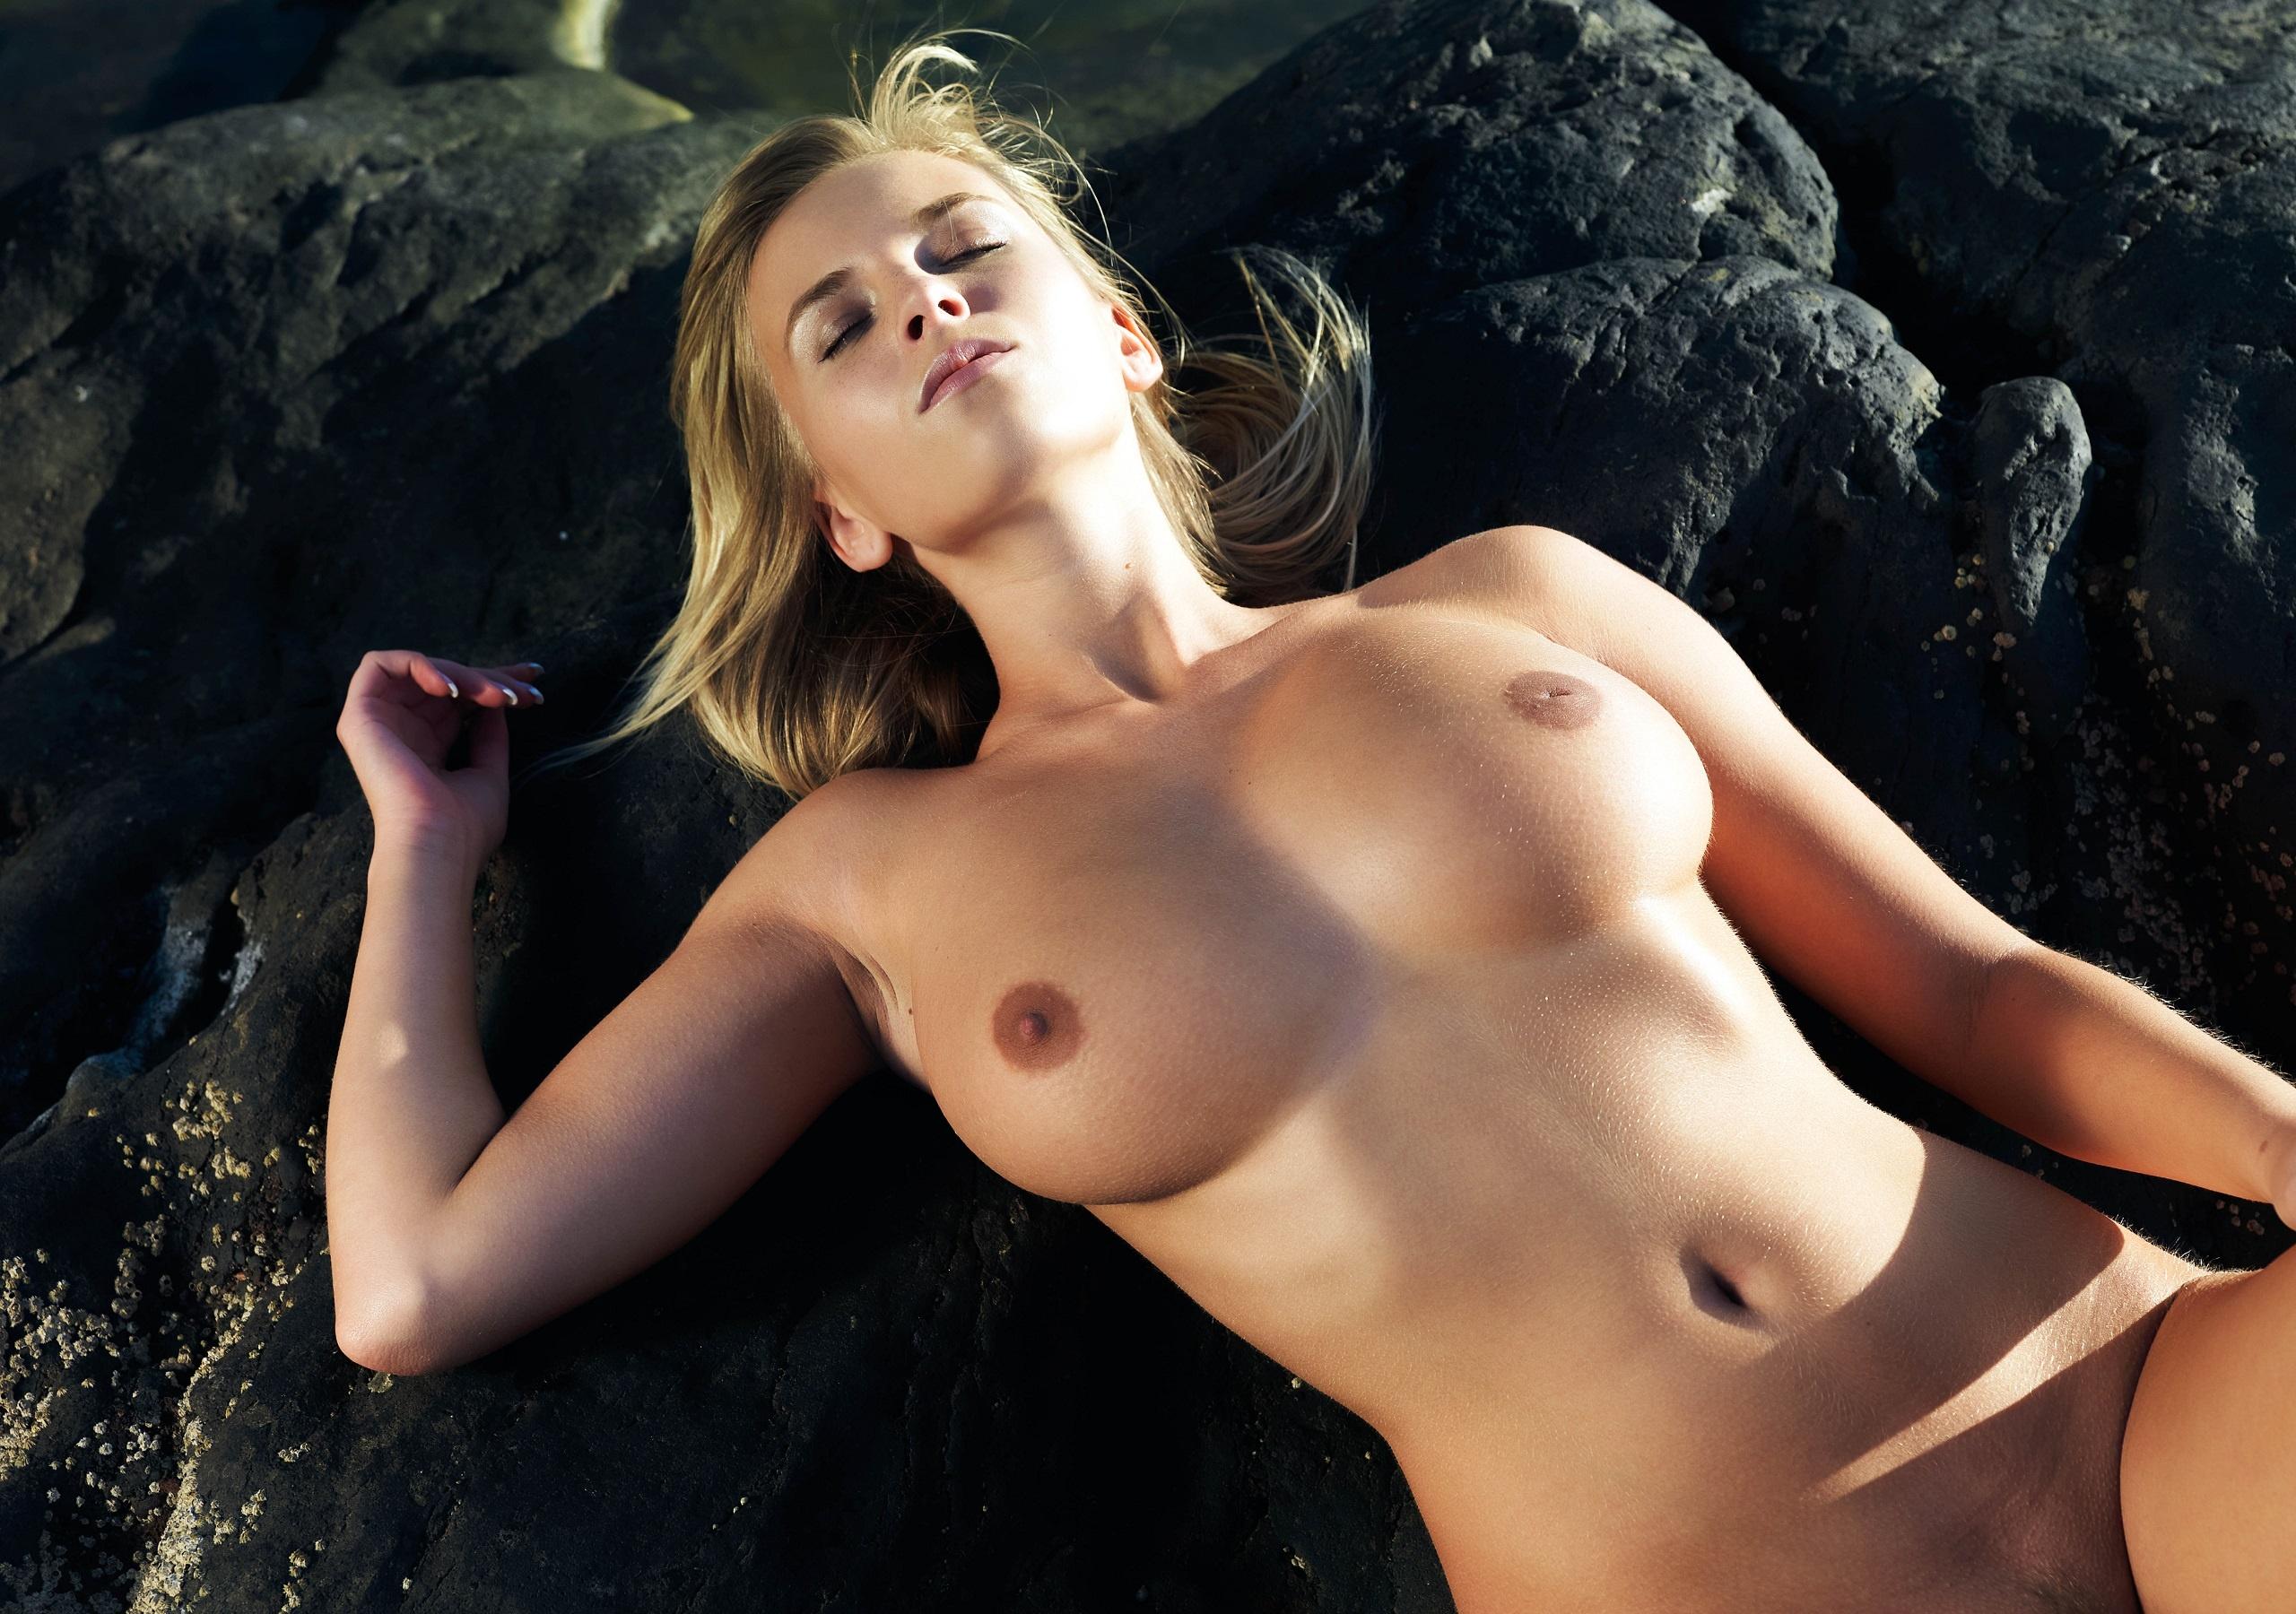 Naked goosebumps pics